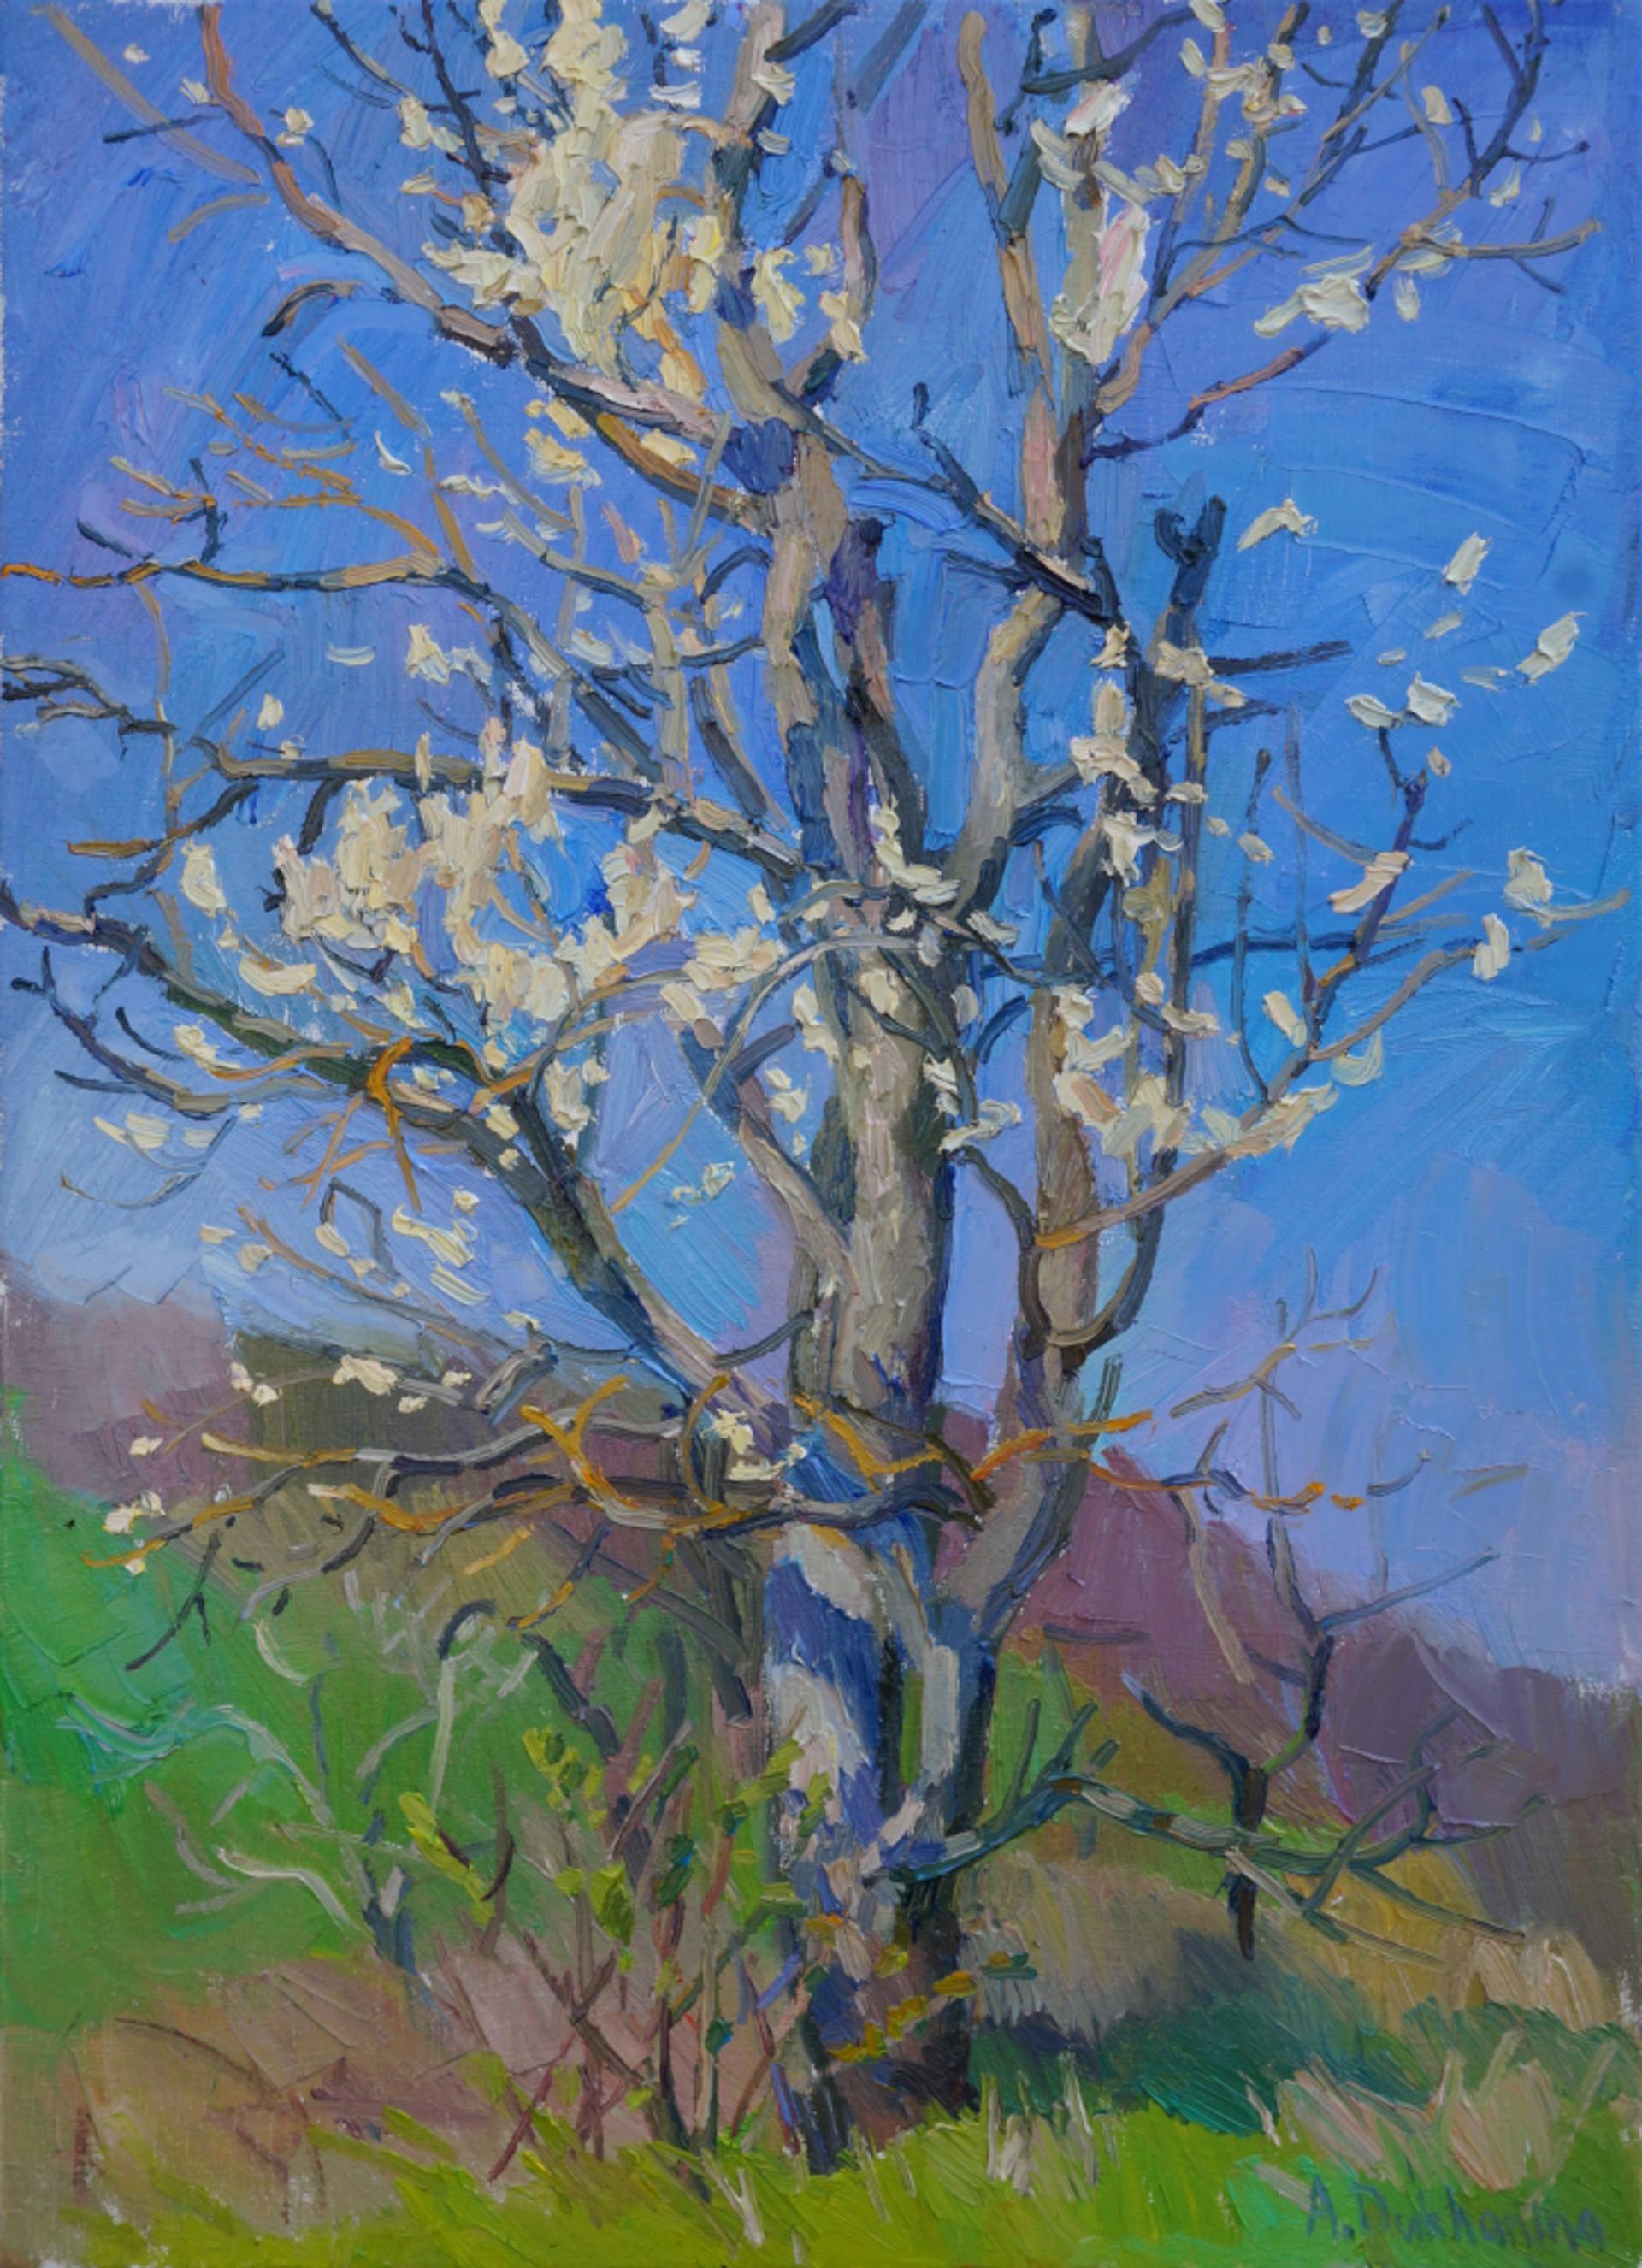 Blooming Tree by Anastasia Dukhanina